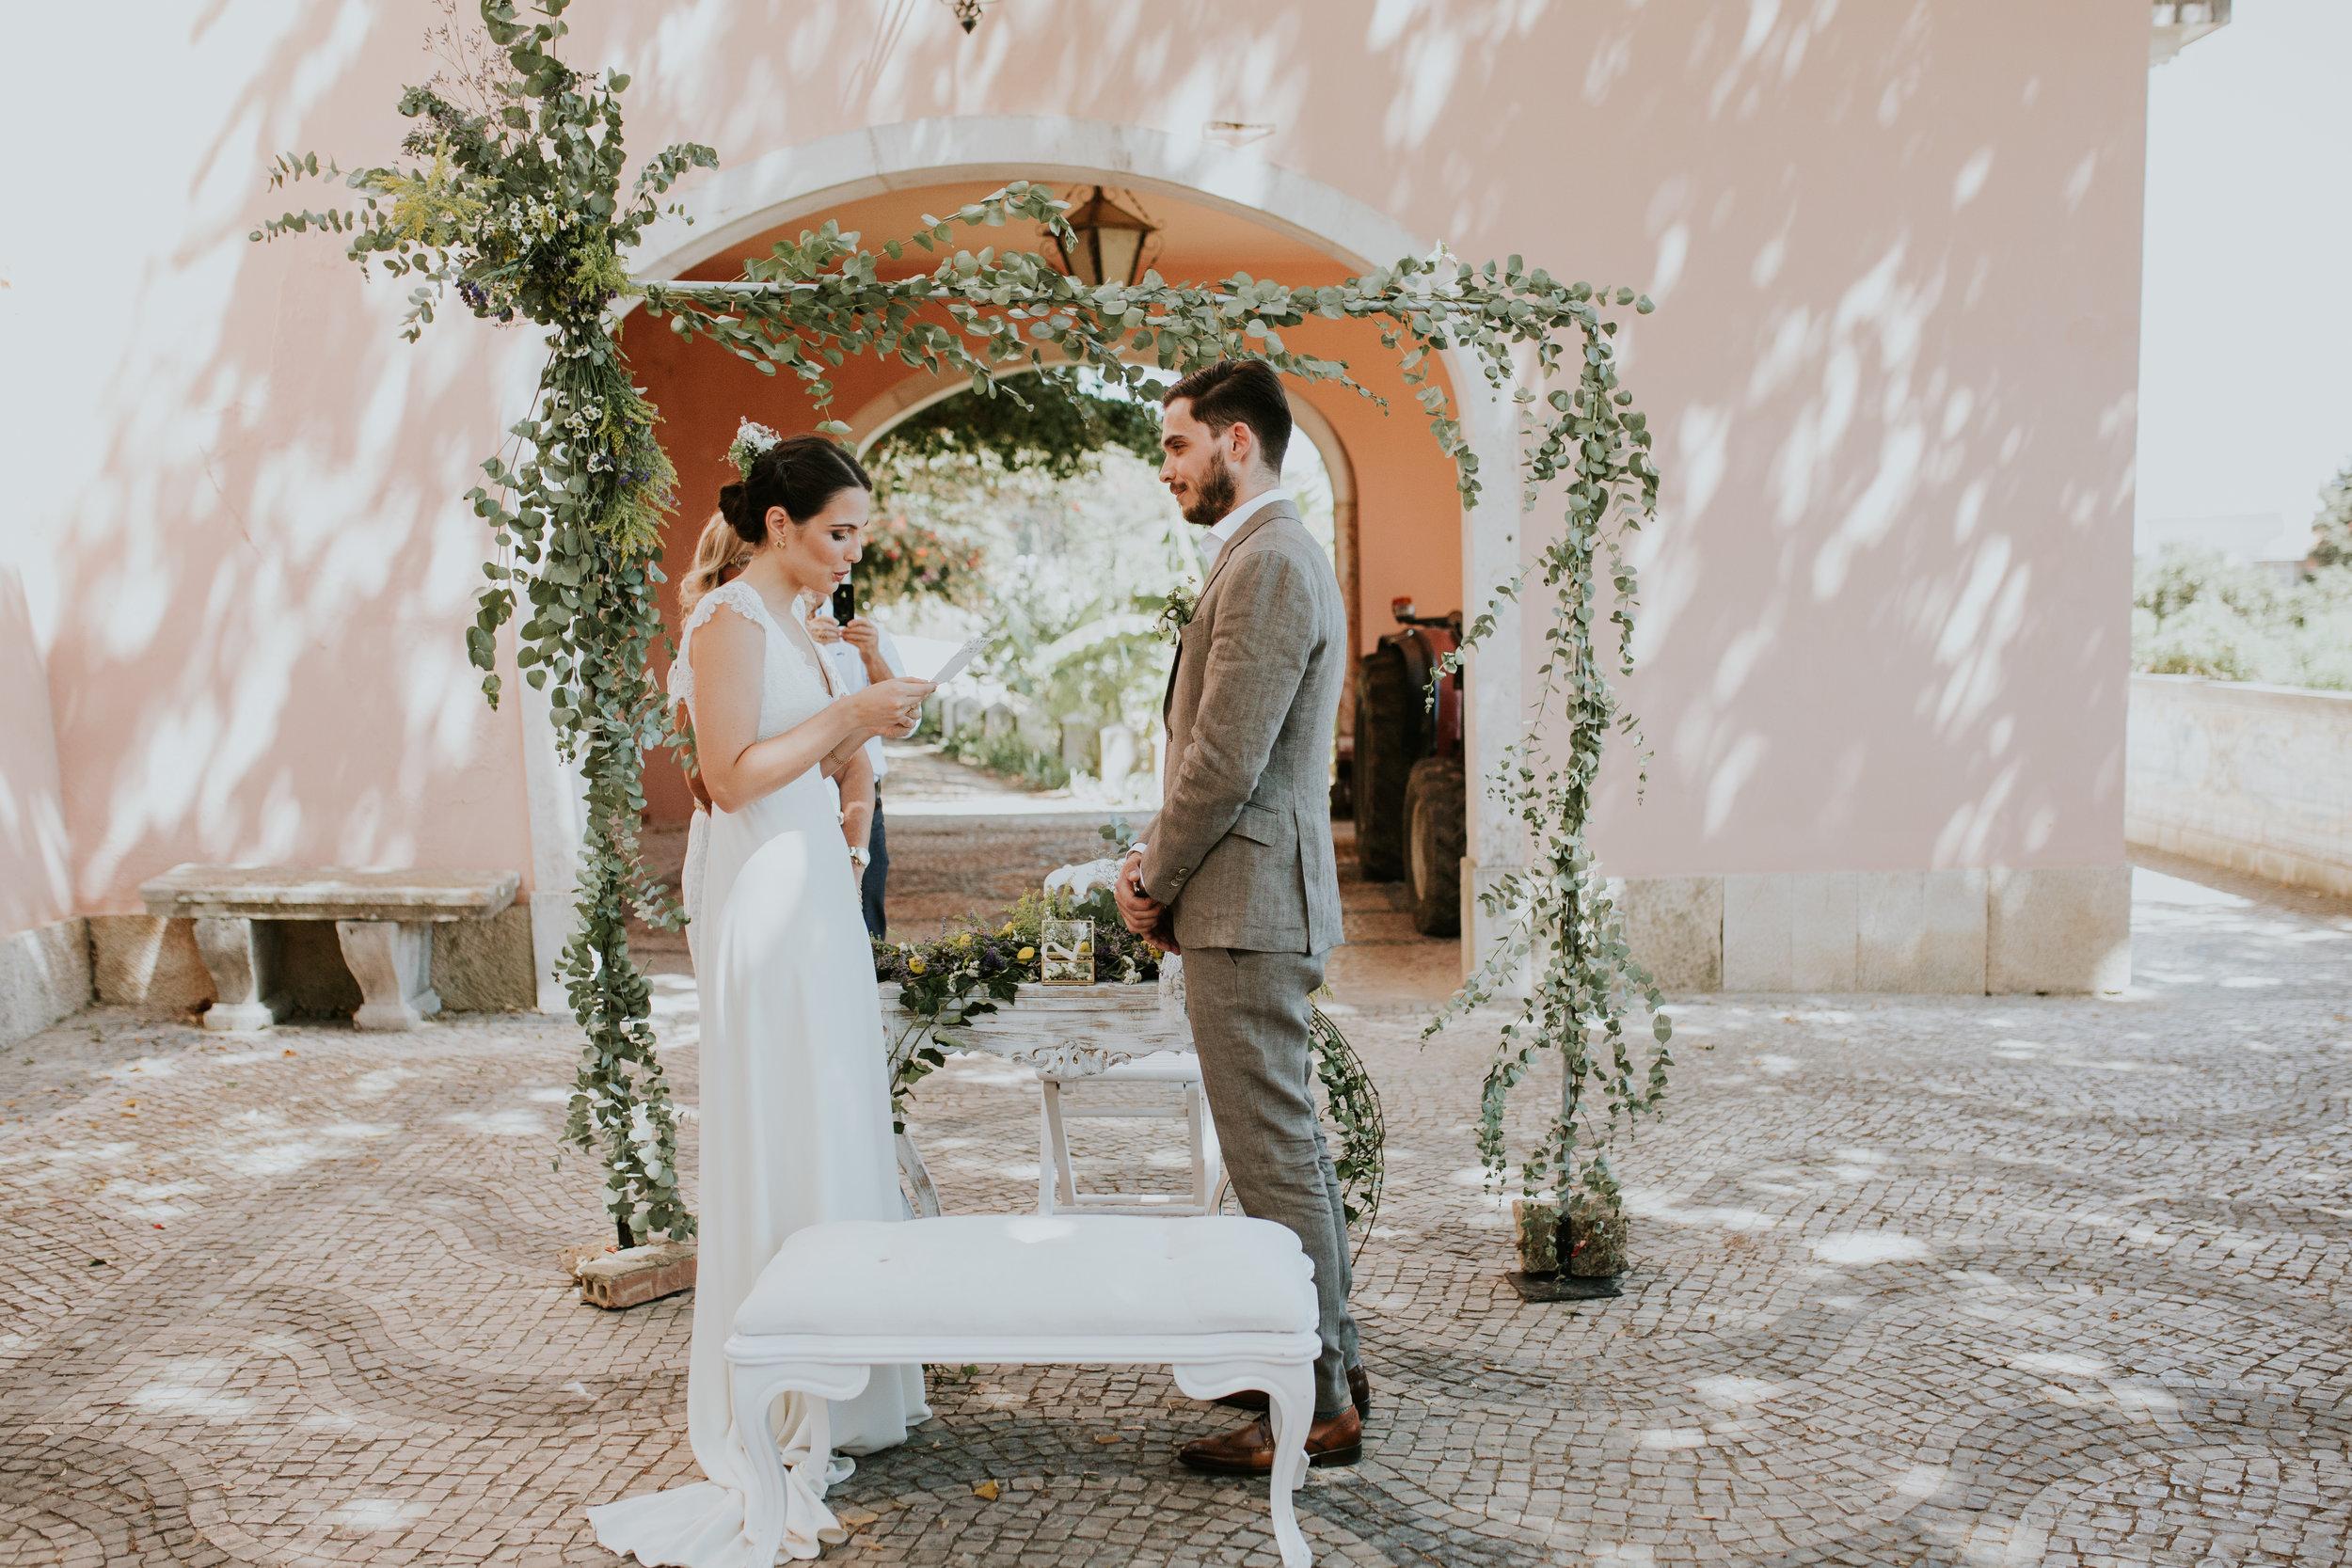 J&P 268_ 02 setembro 2017 Wedding day_.jpg